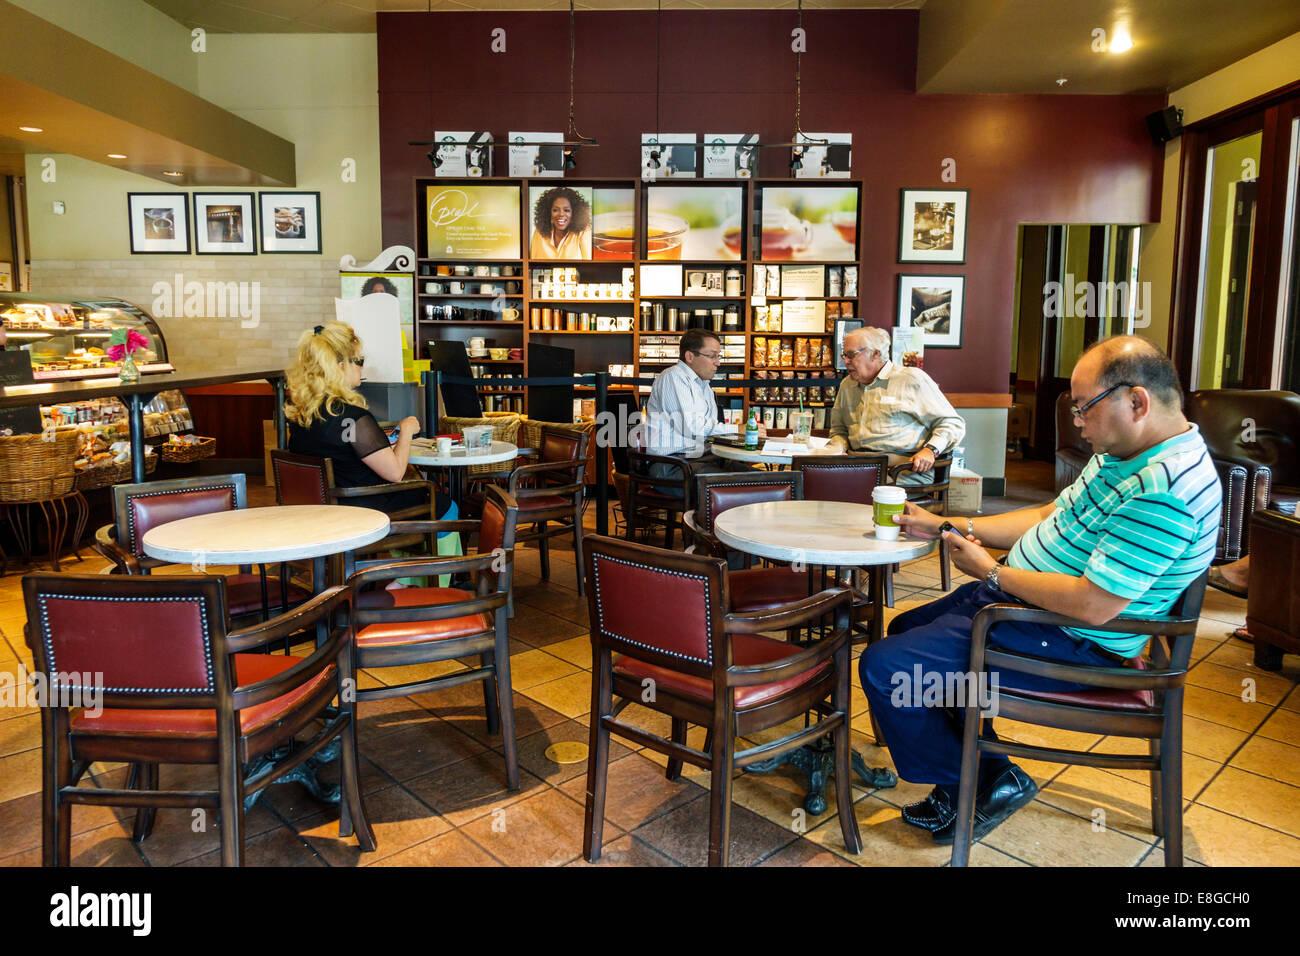 Naples Florida 5th Avenue Starbucks Coffee Cafe Inside Interior